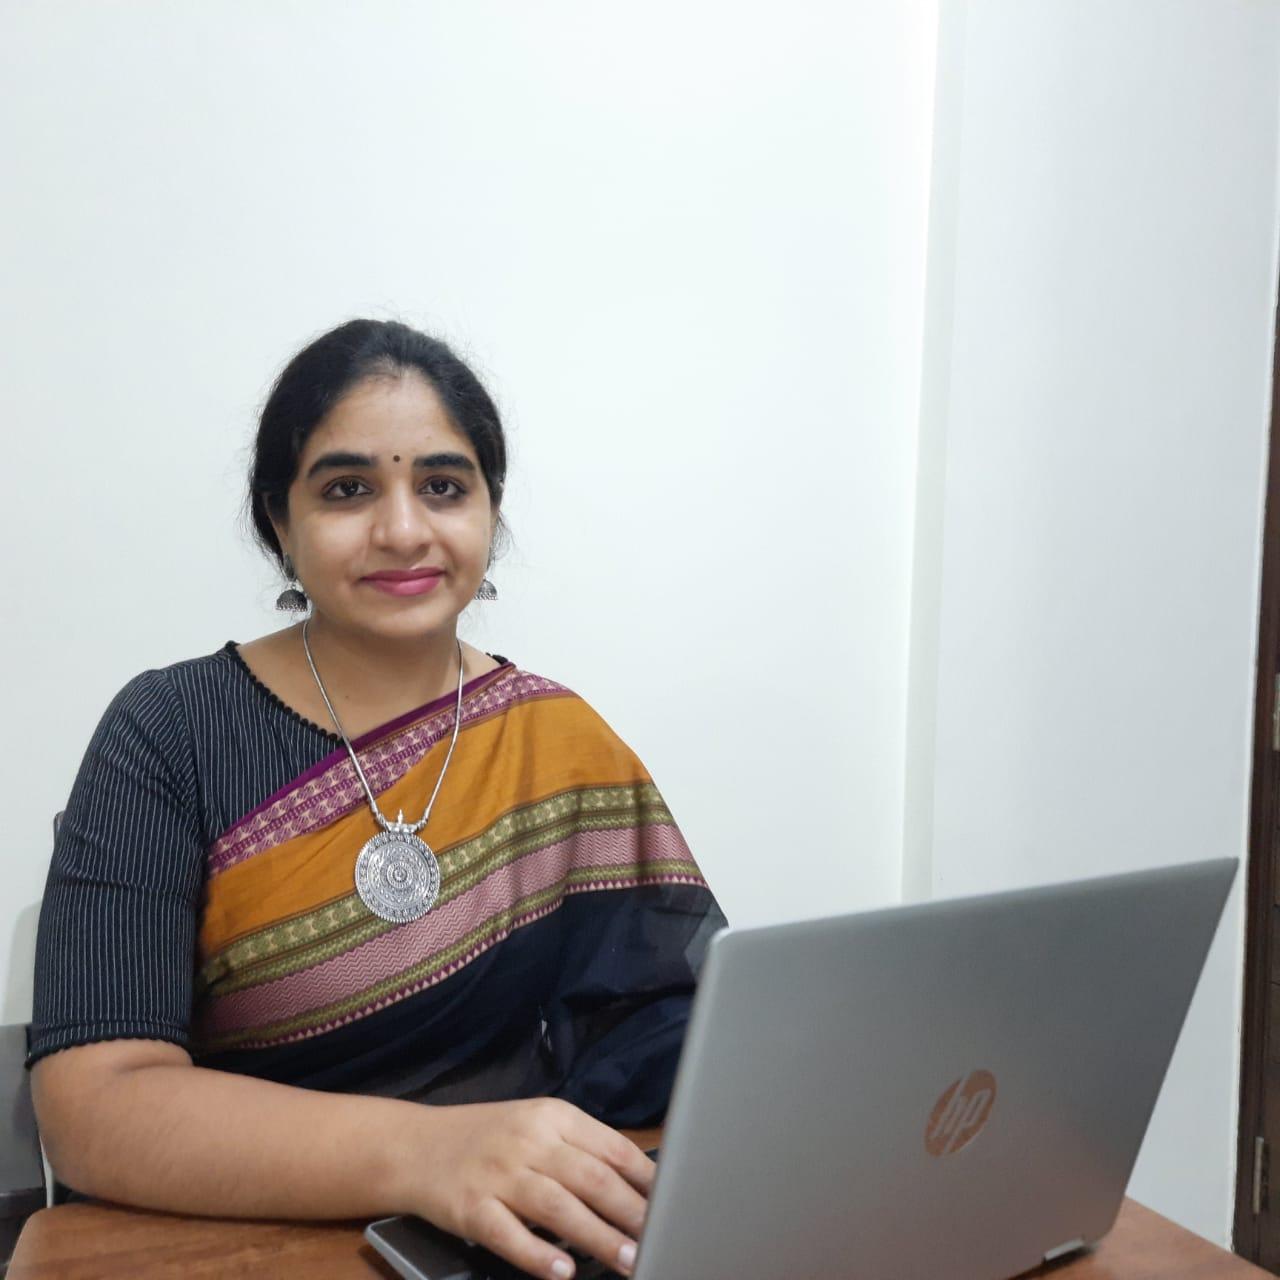 Urvashi Nagpal